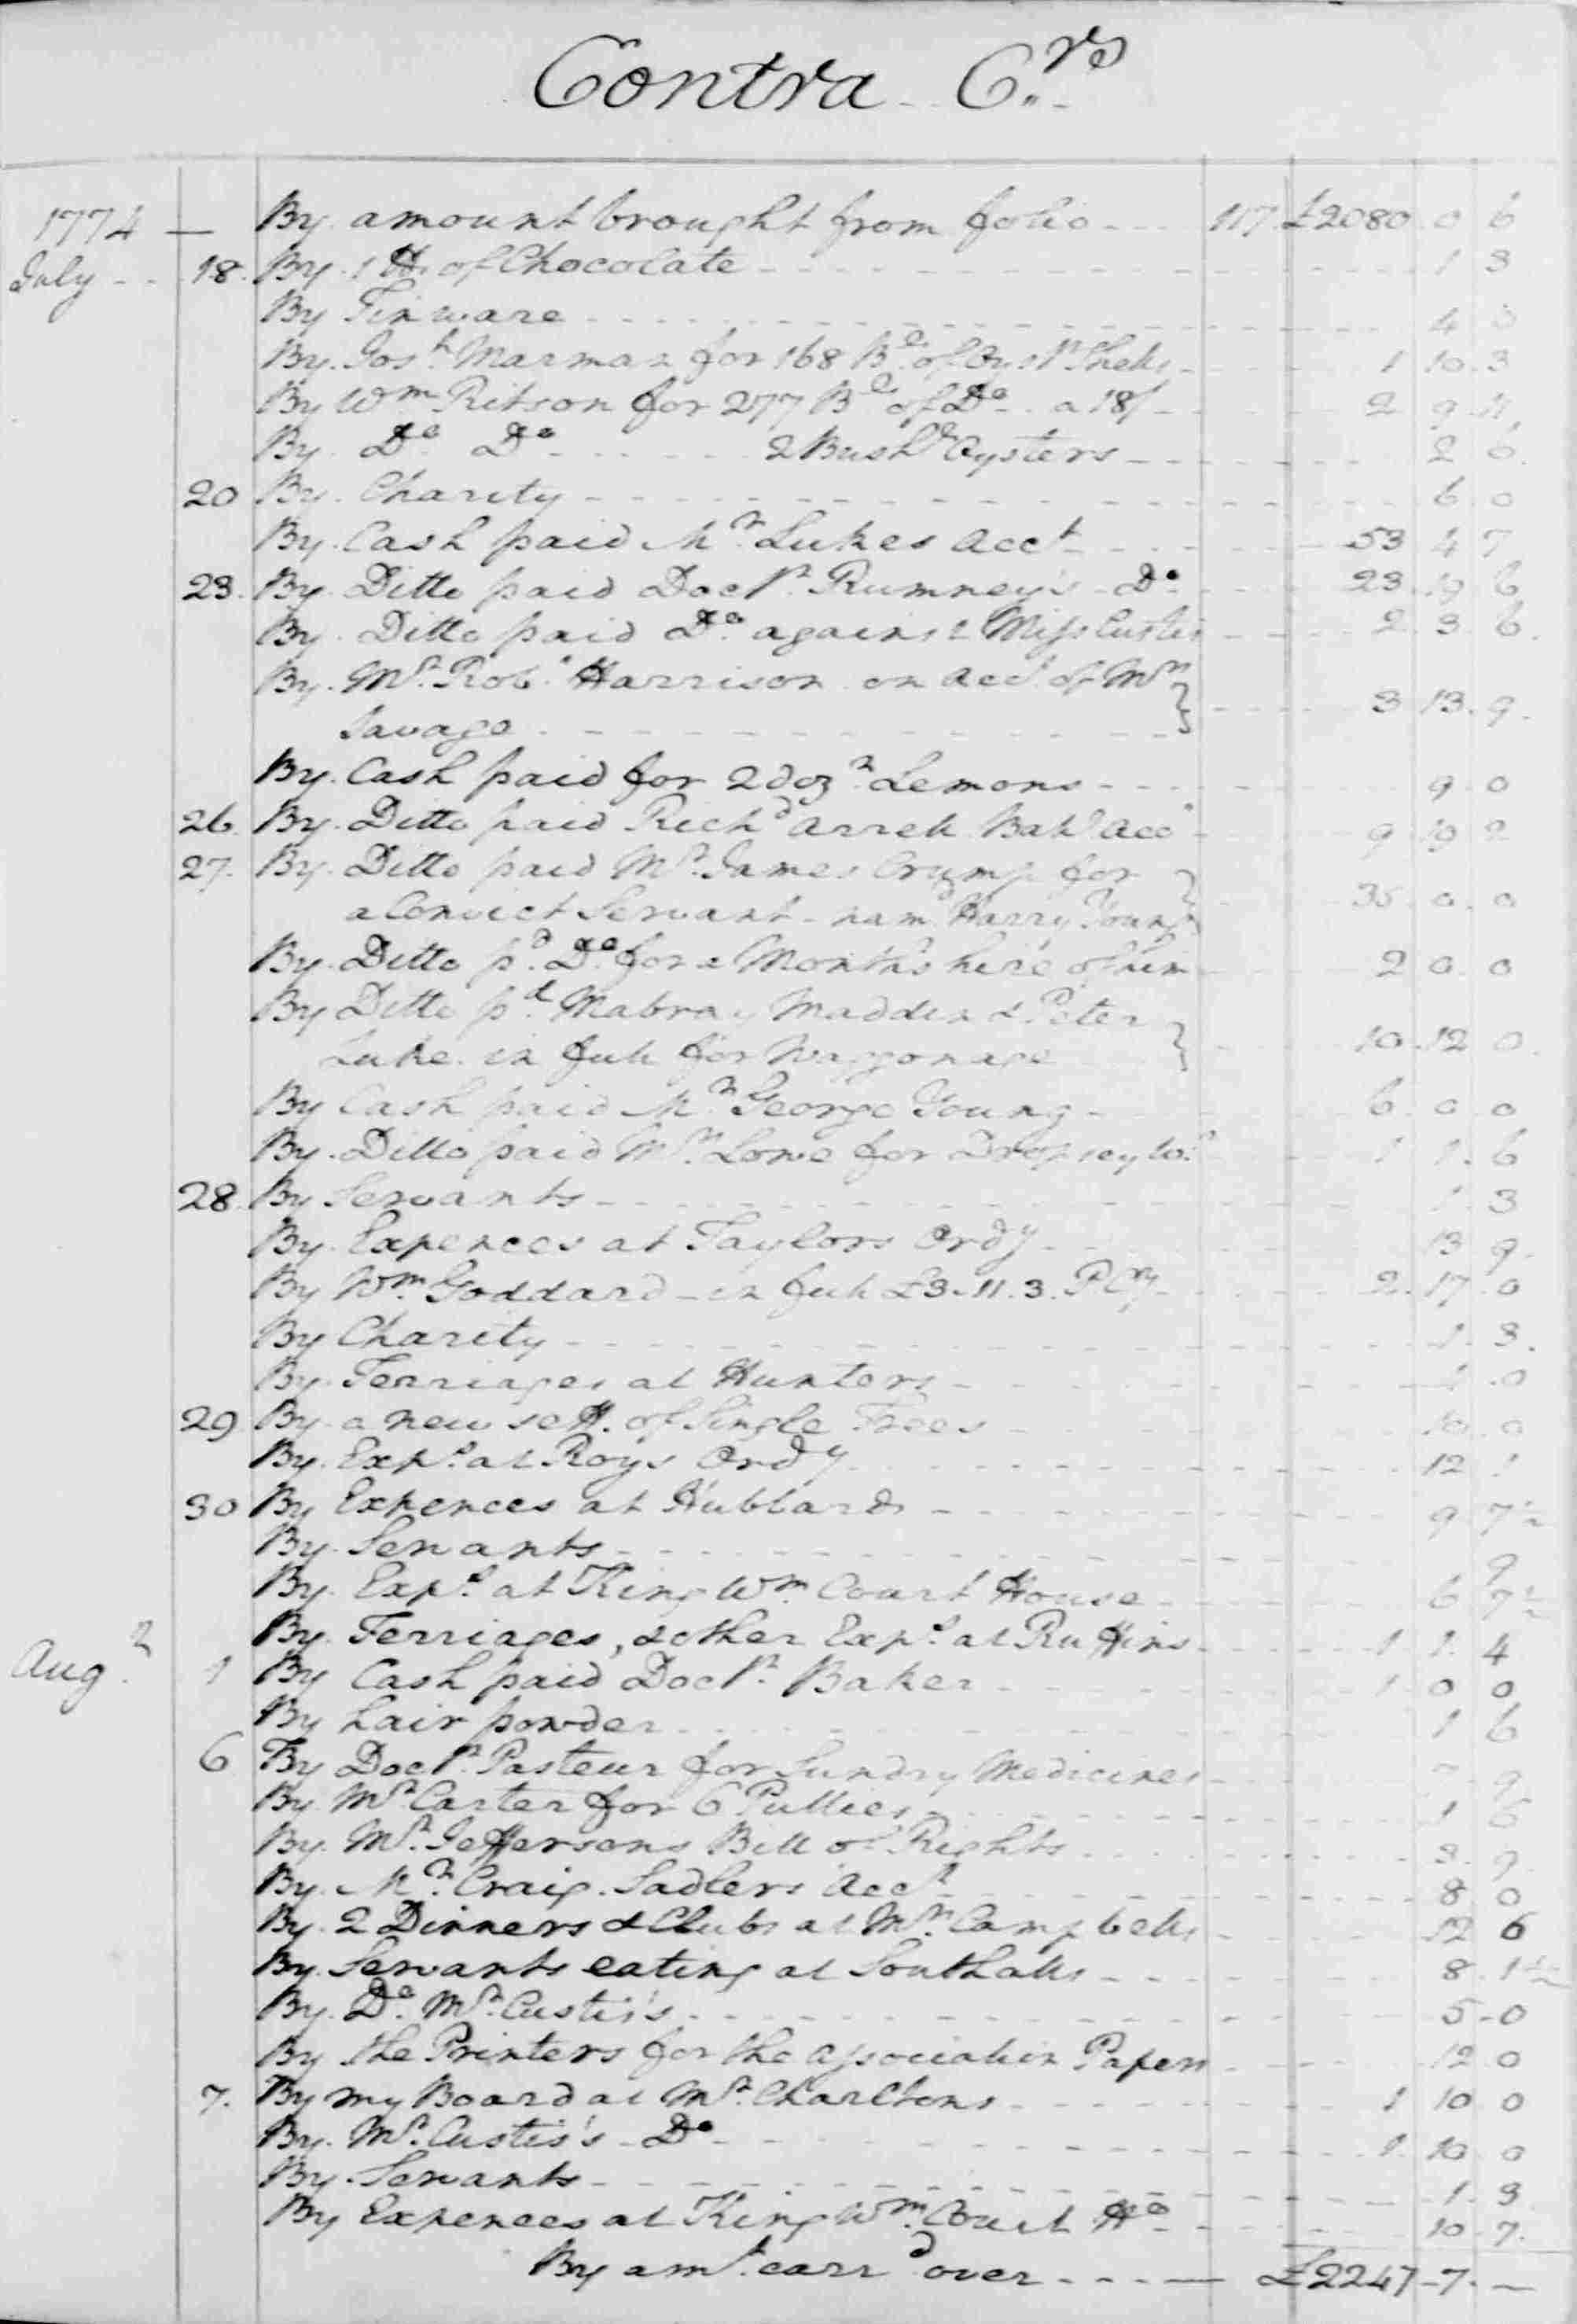 Ledger B, folio 120, right side